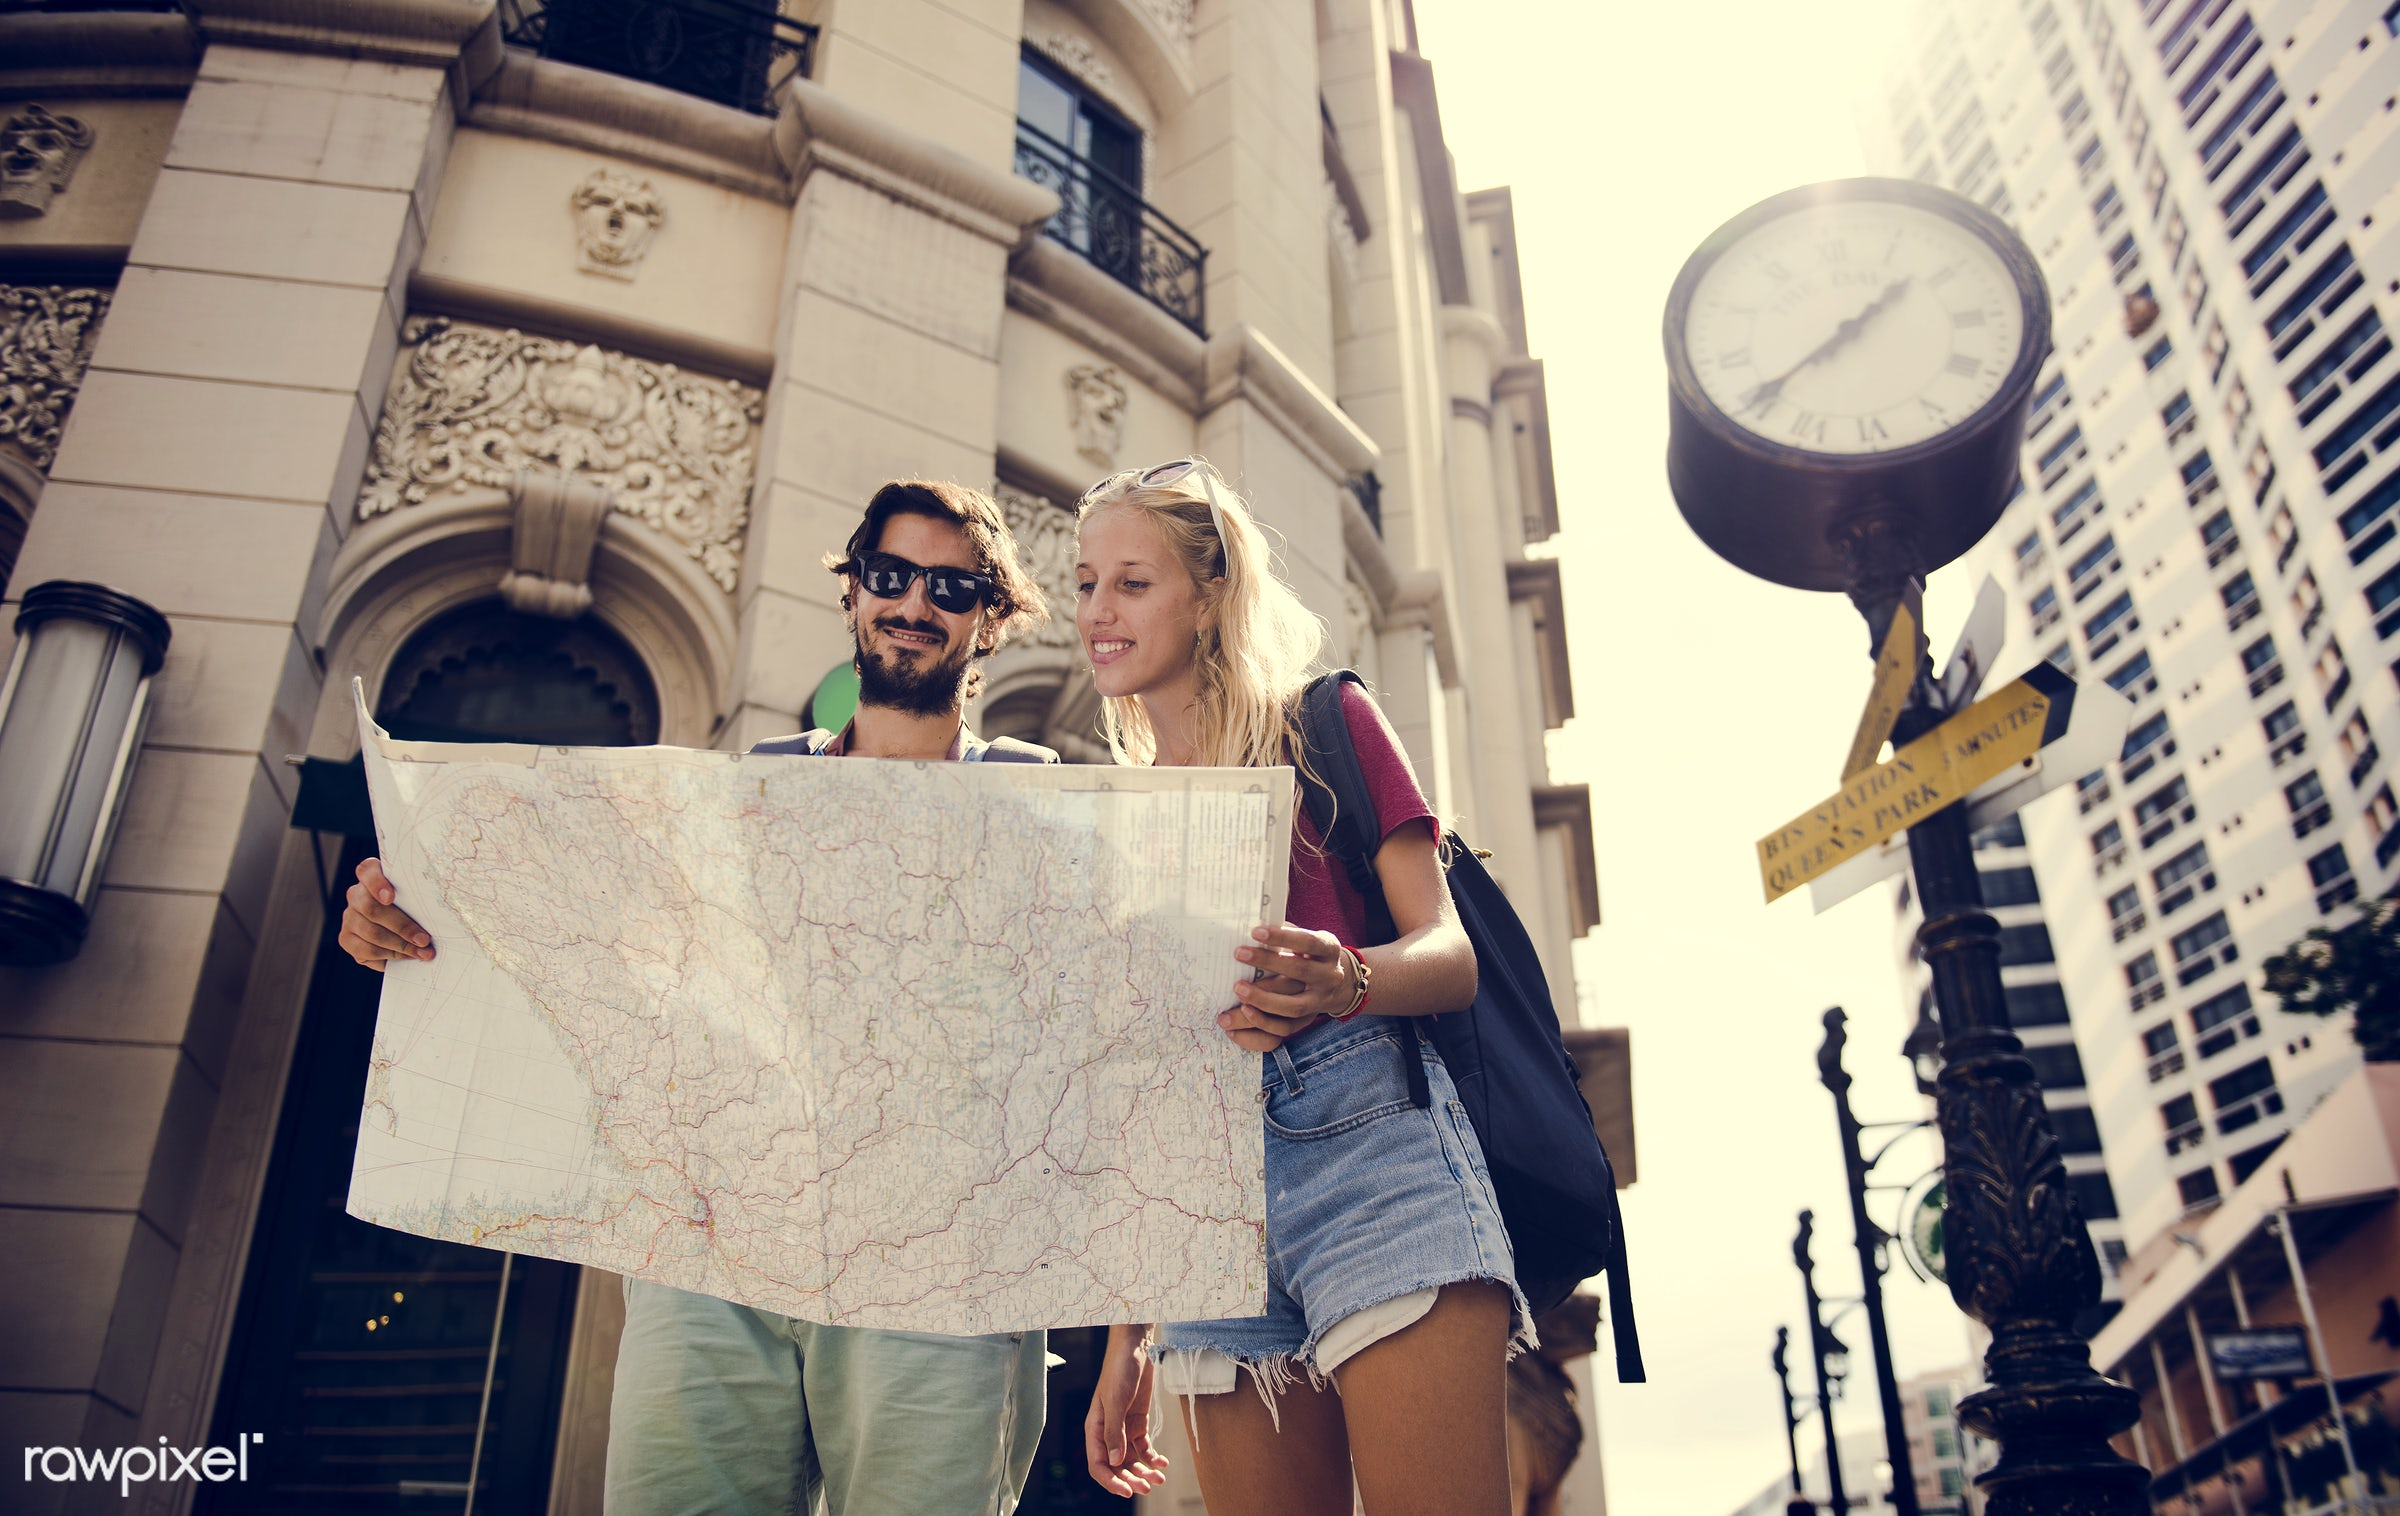 metropolis, backpackers, travel, people, together, wanderlust, city, center, woman, buildings, partner, smile, smiling,...